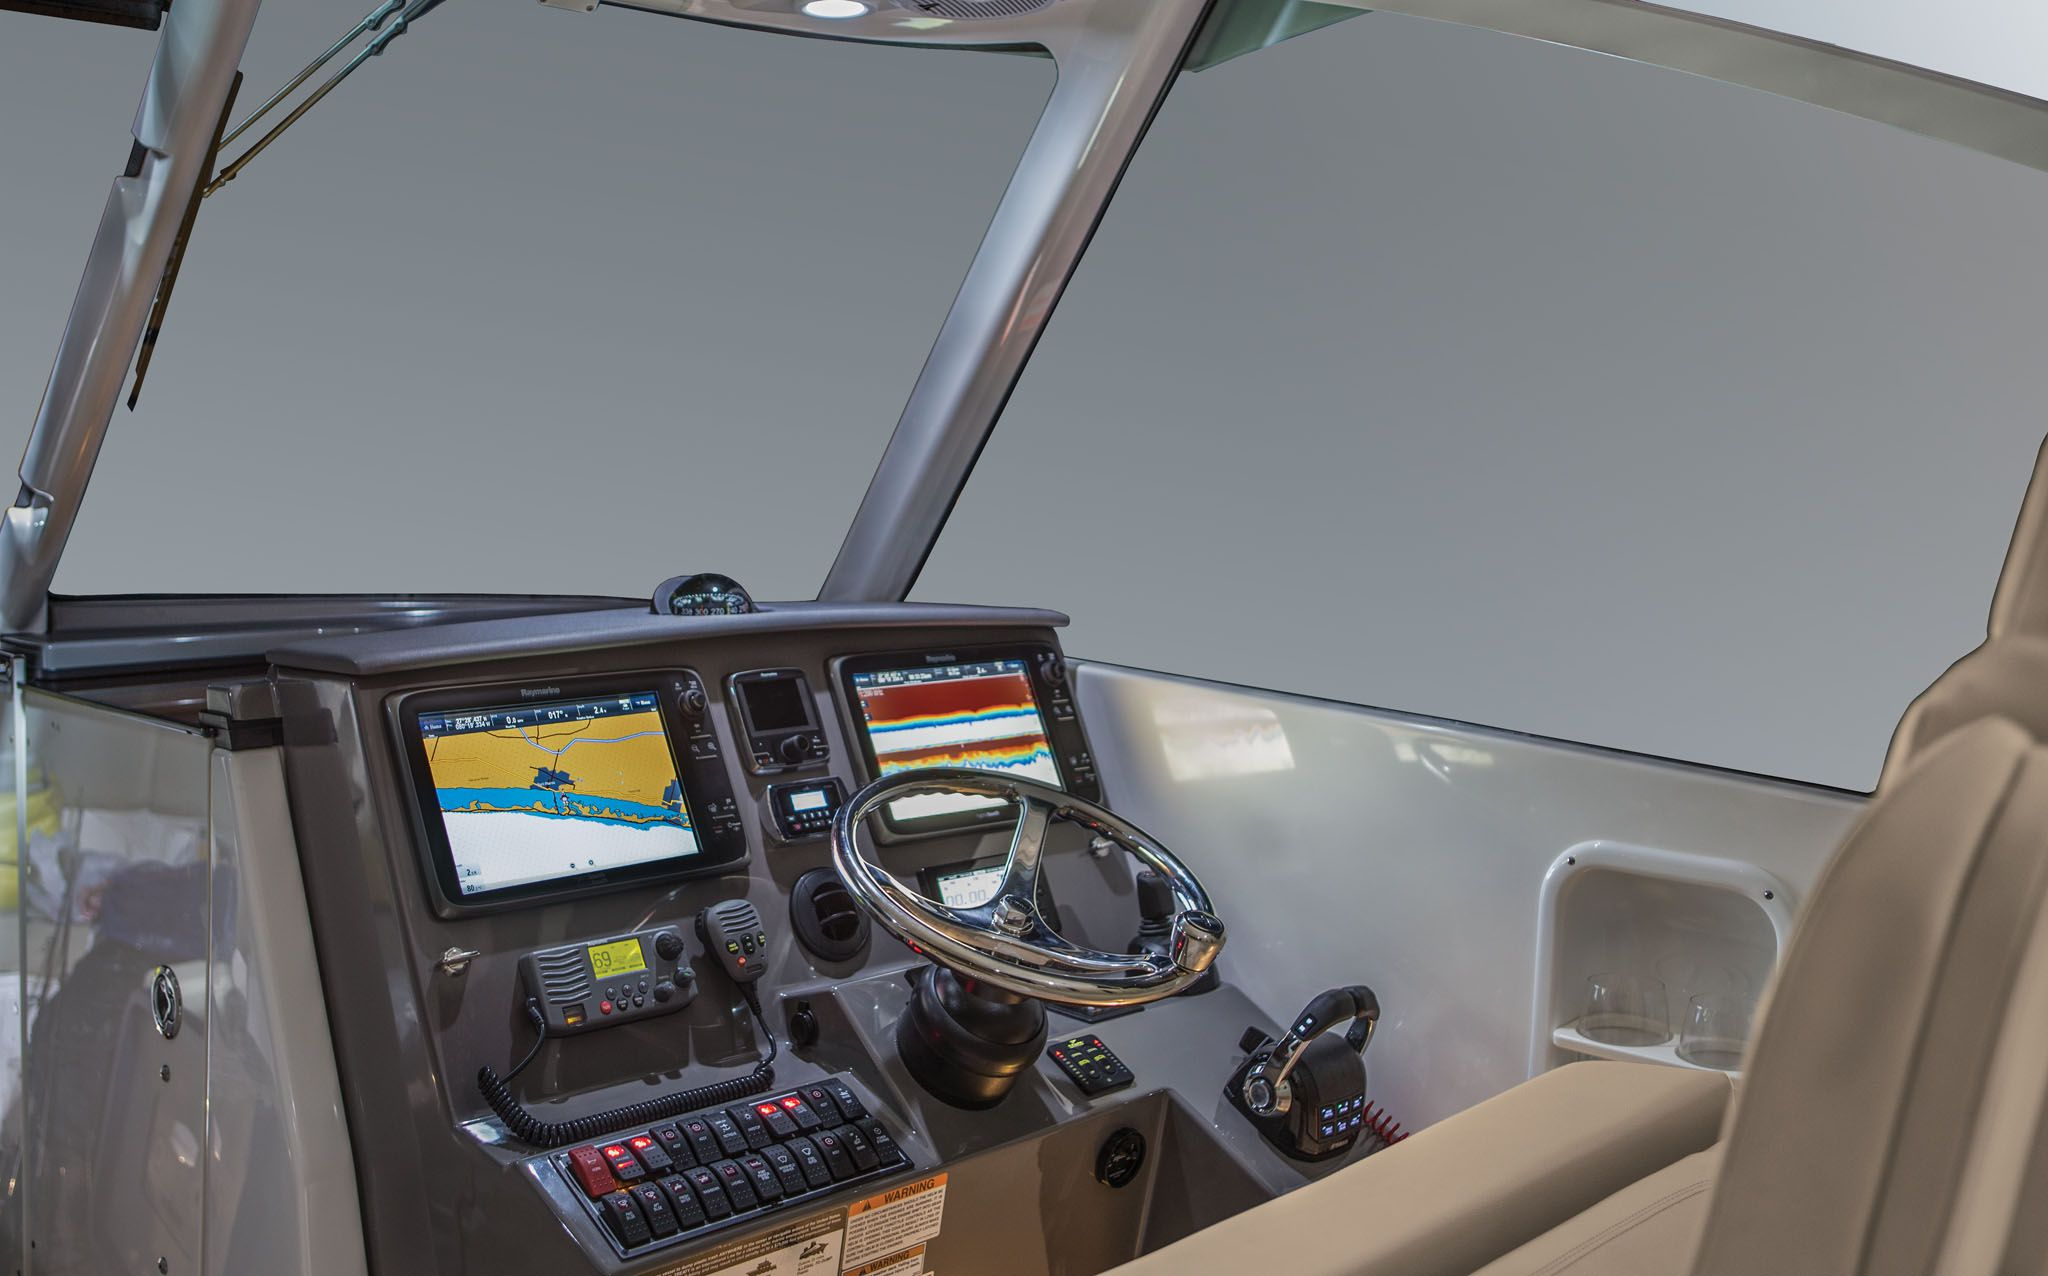 PB-DC325-Helm-LG.jpg